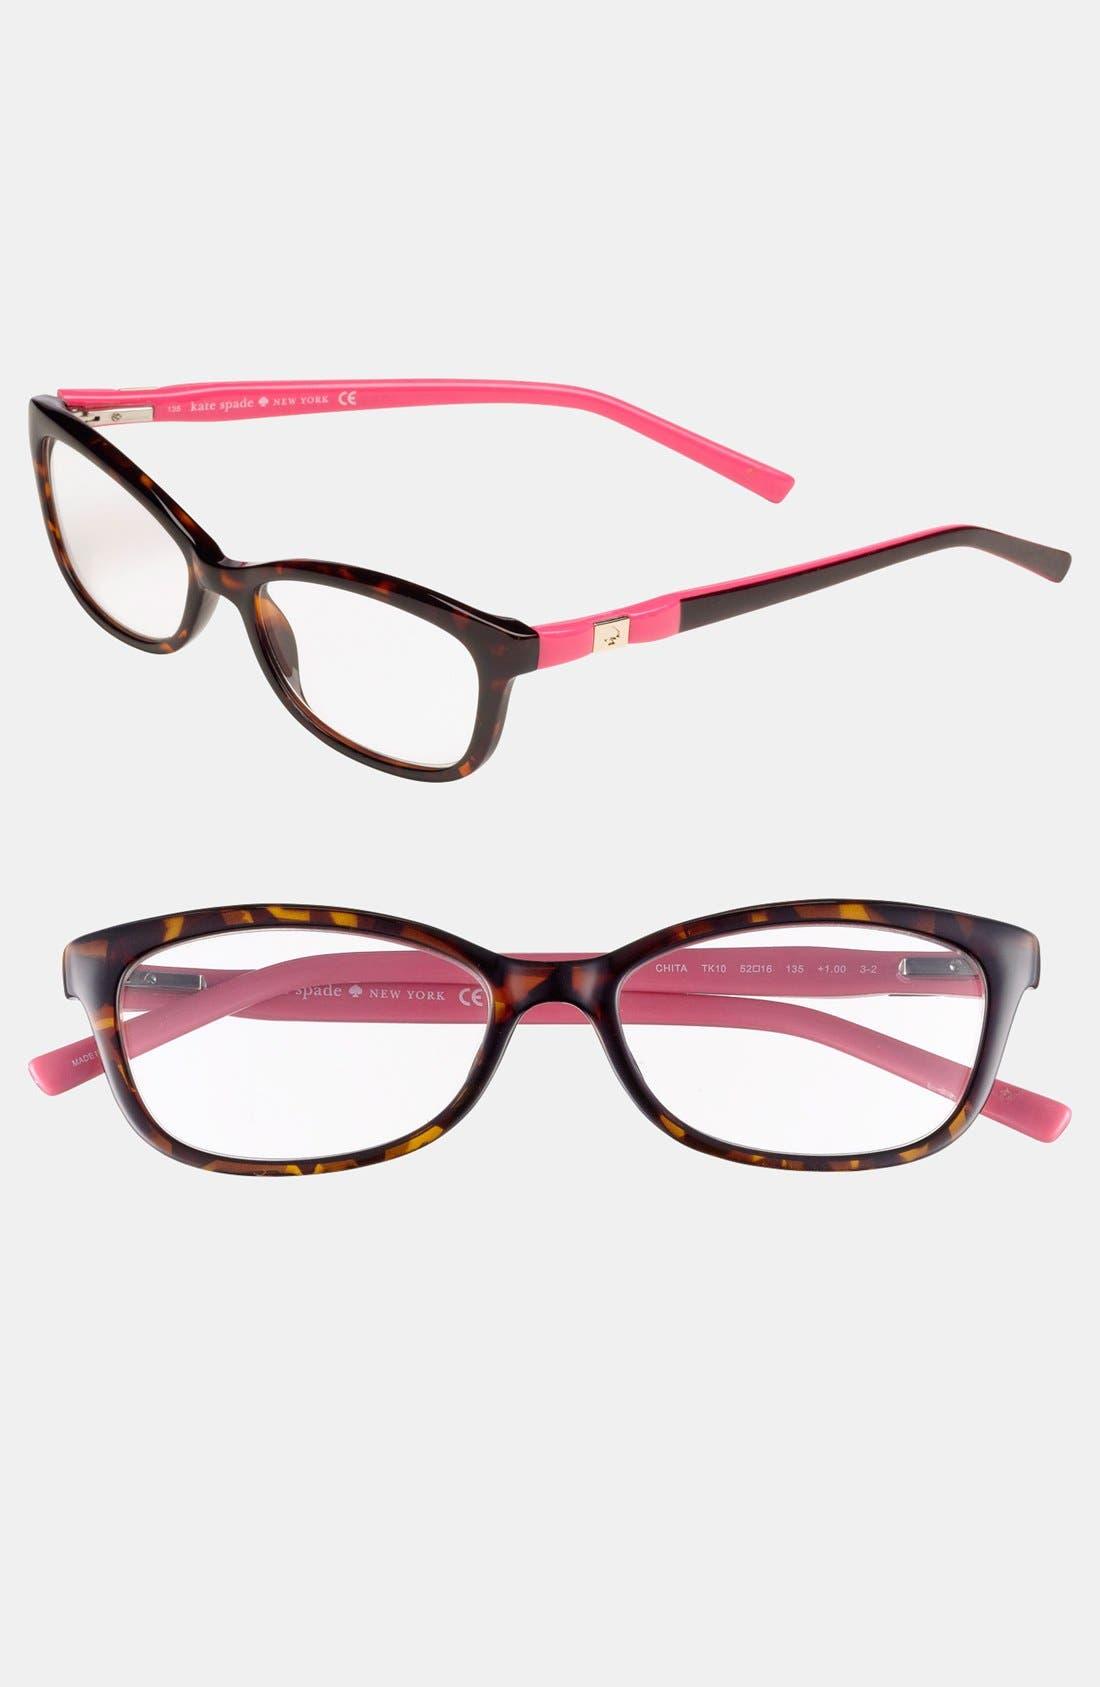 Alternate Image 1 Selected - kate spade new york 'chita' 52mm reading glasses